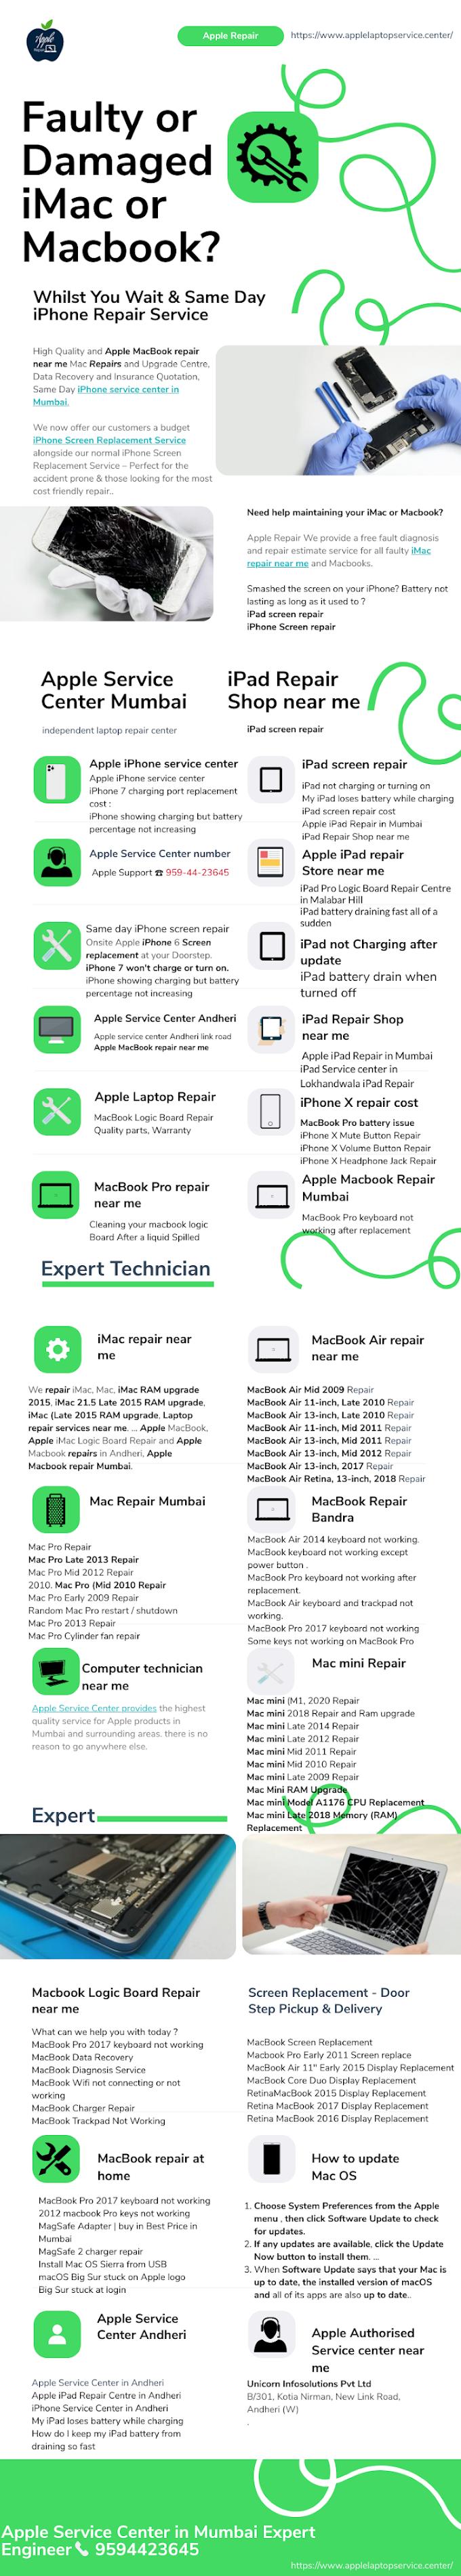 Apple Service Centre in Mumbai | Call Expert Technician